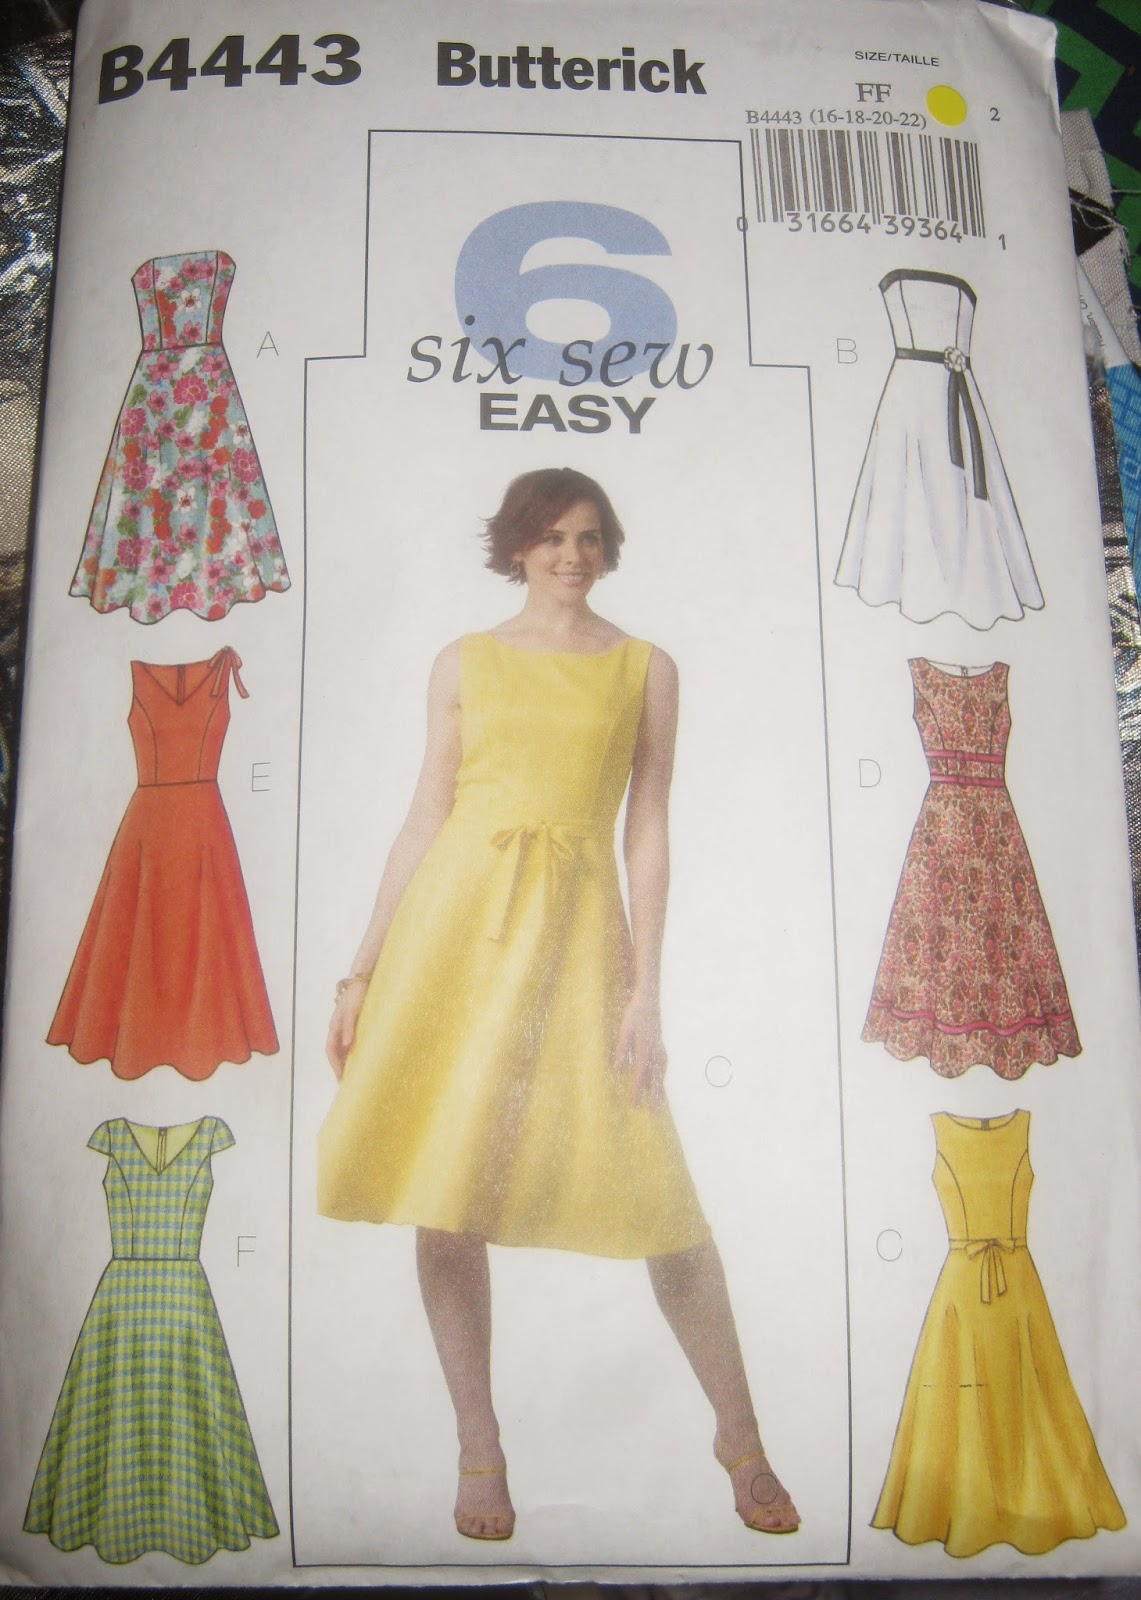 Butterick 4443 Princess Seam Dress Pattern www.sewplus.blogspot.com